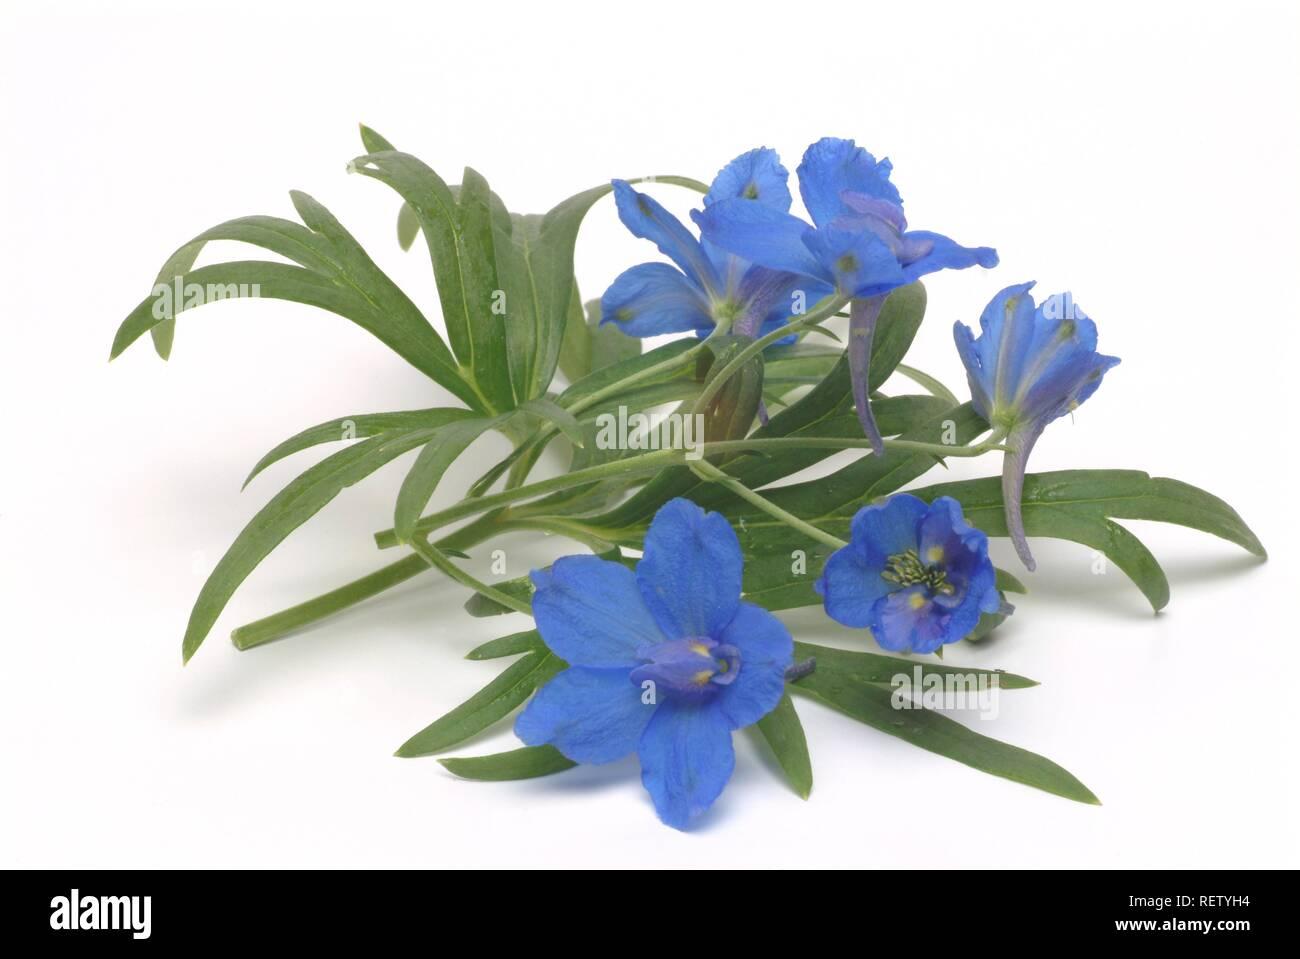 Forking Larkspur (Consolida regalis, Delphinium consolida, Speronelle consolida), medicinal plant - Stock Image